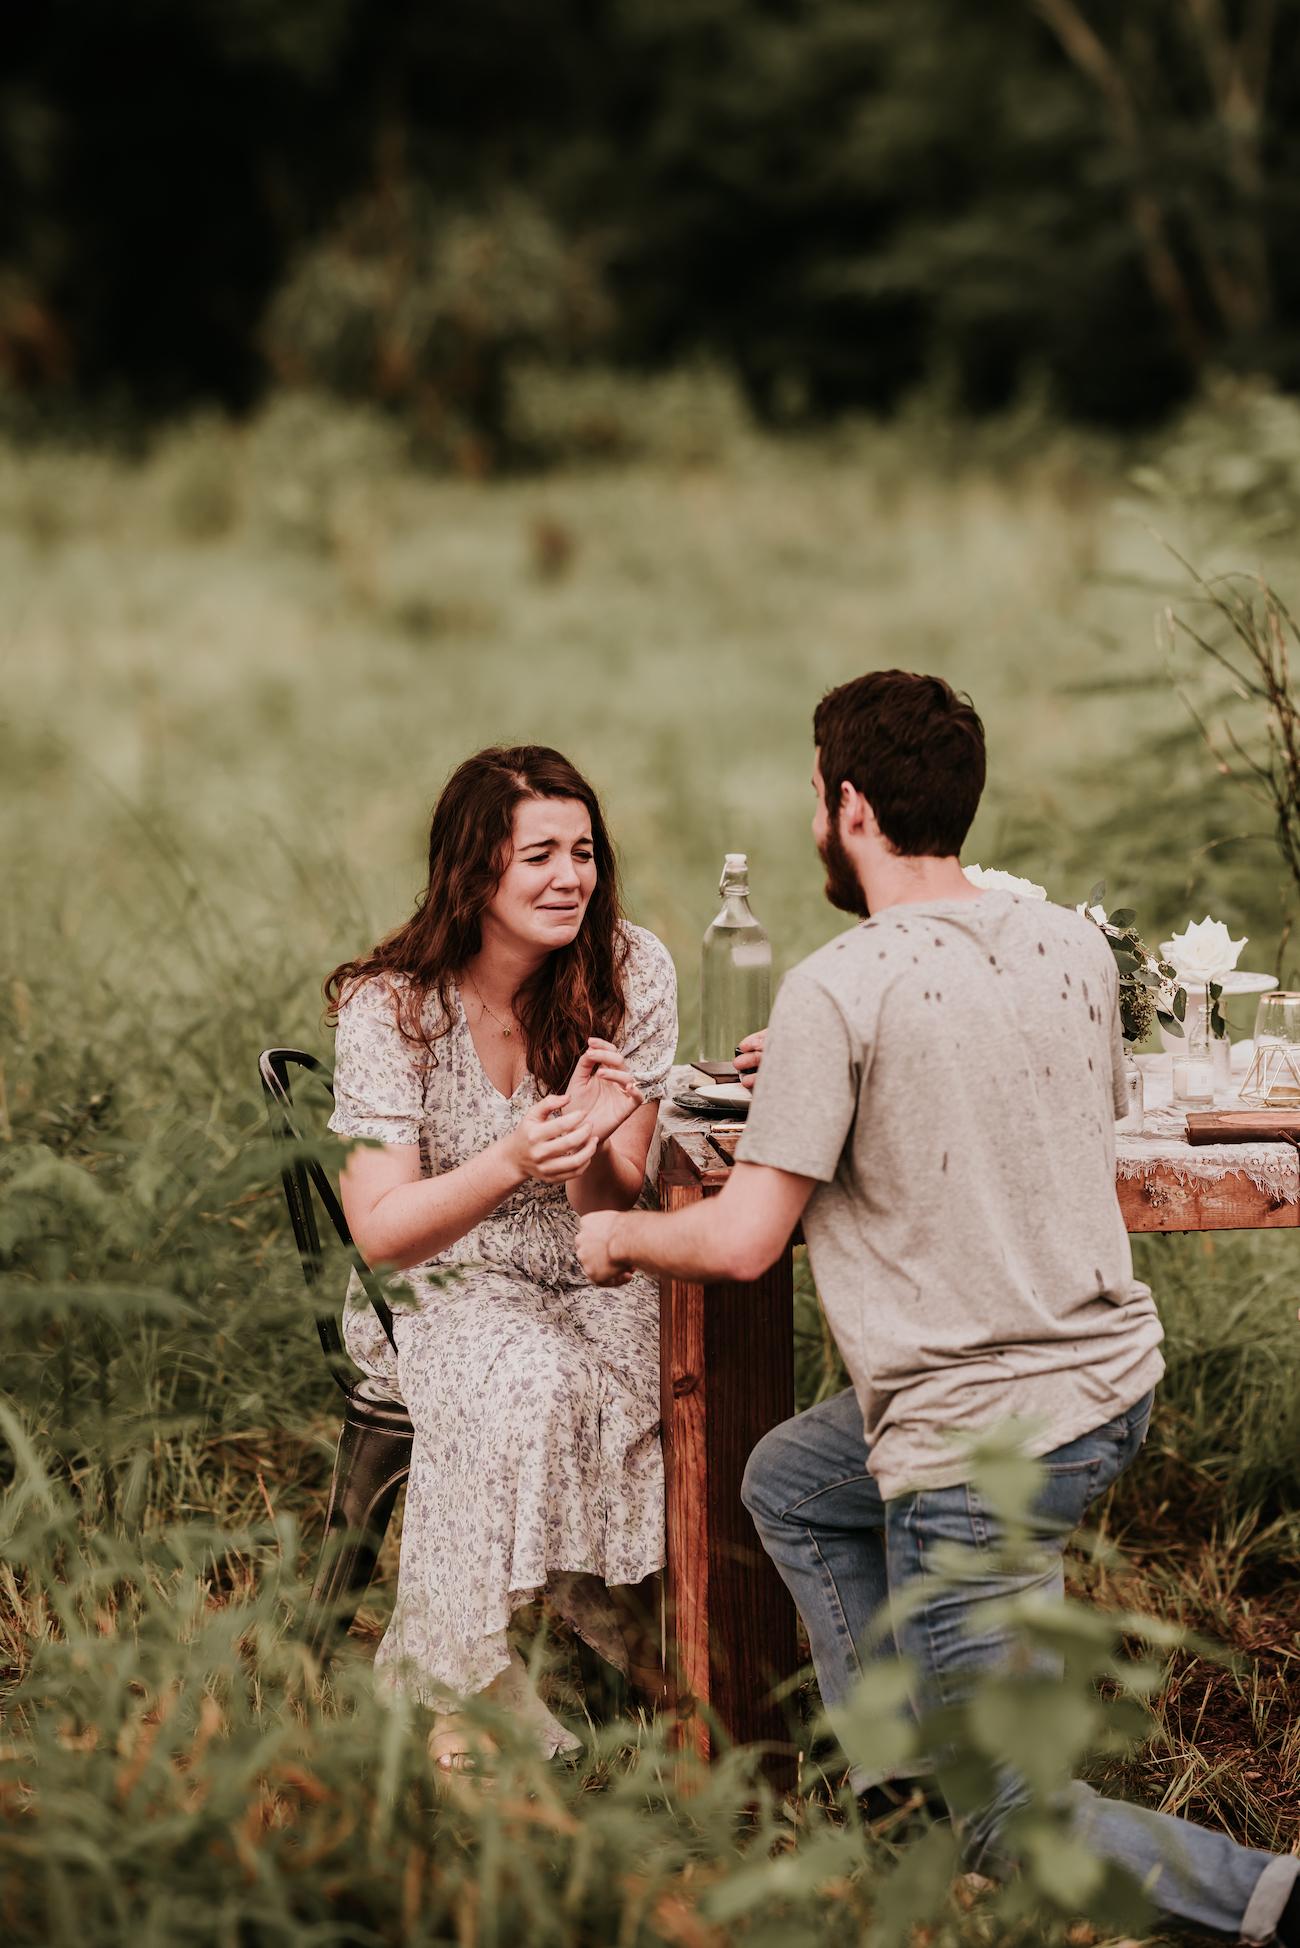 tampa-engagement-proposal-photography-49.jpeg